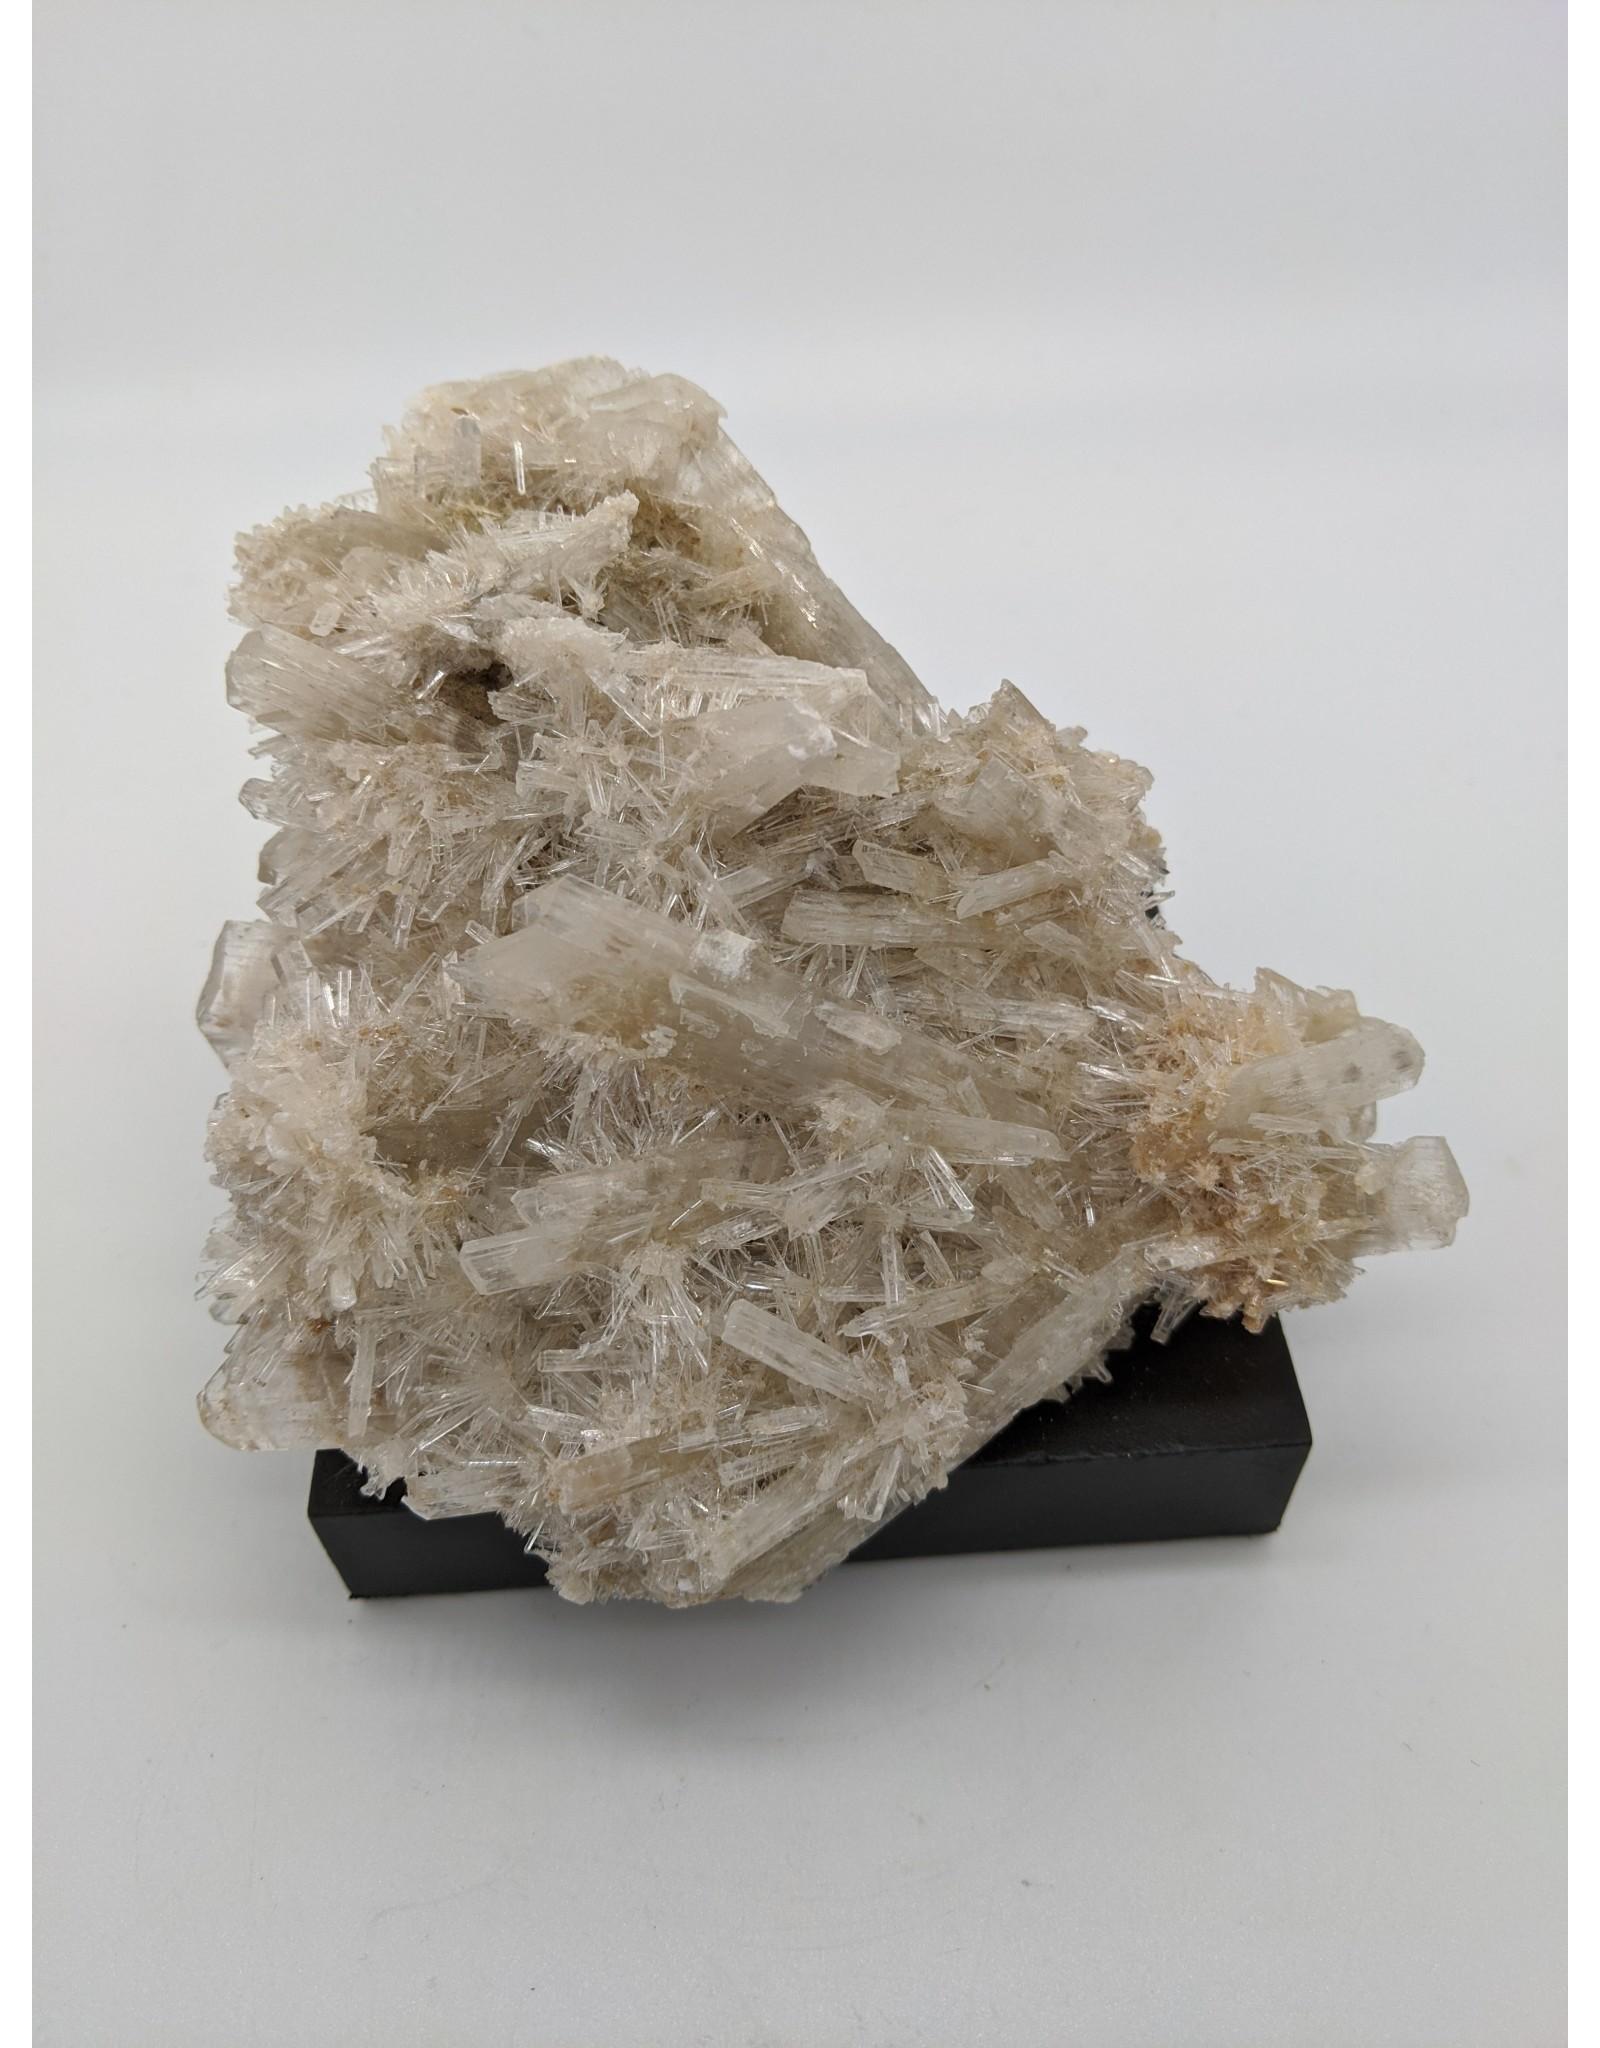 Selenite Crystal Specimen